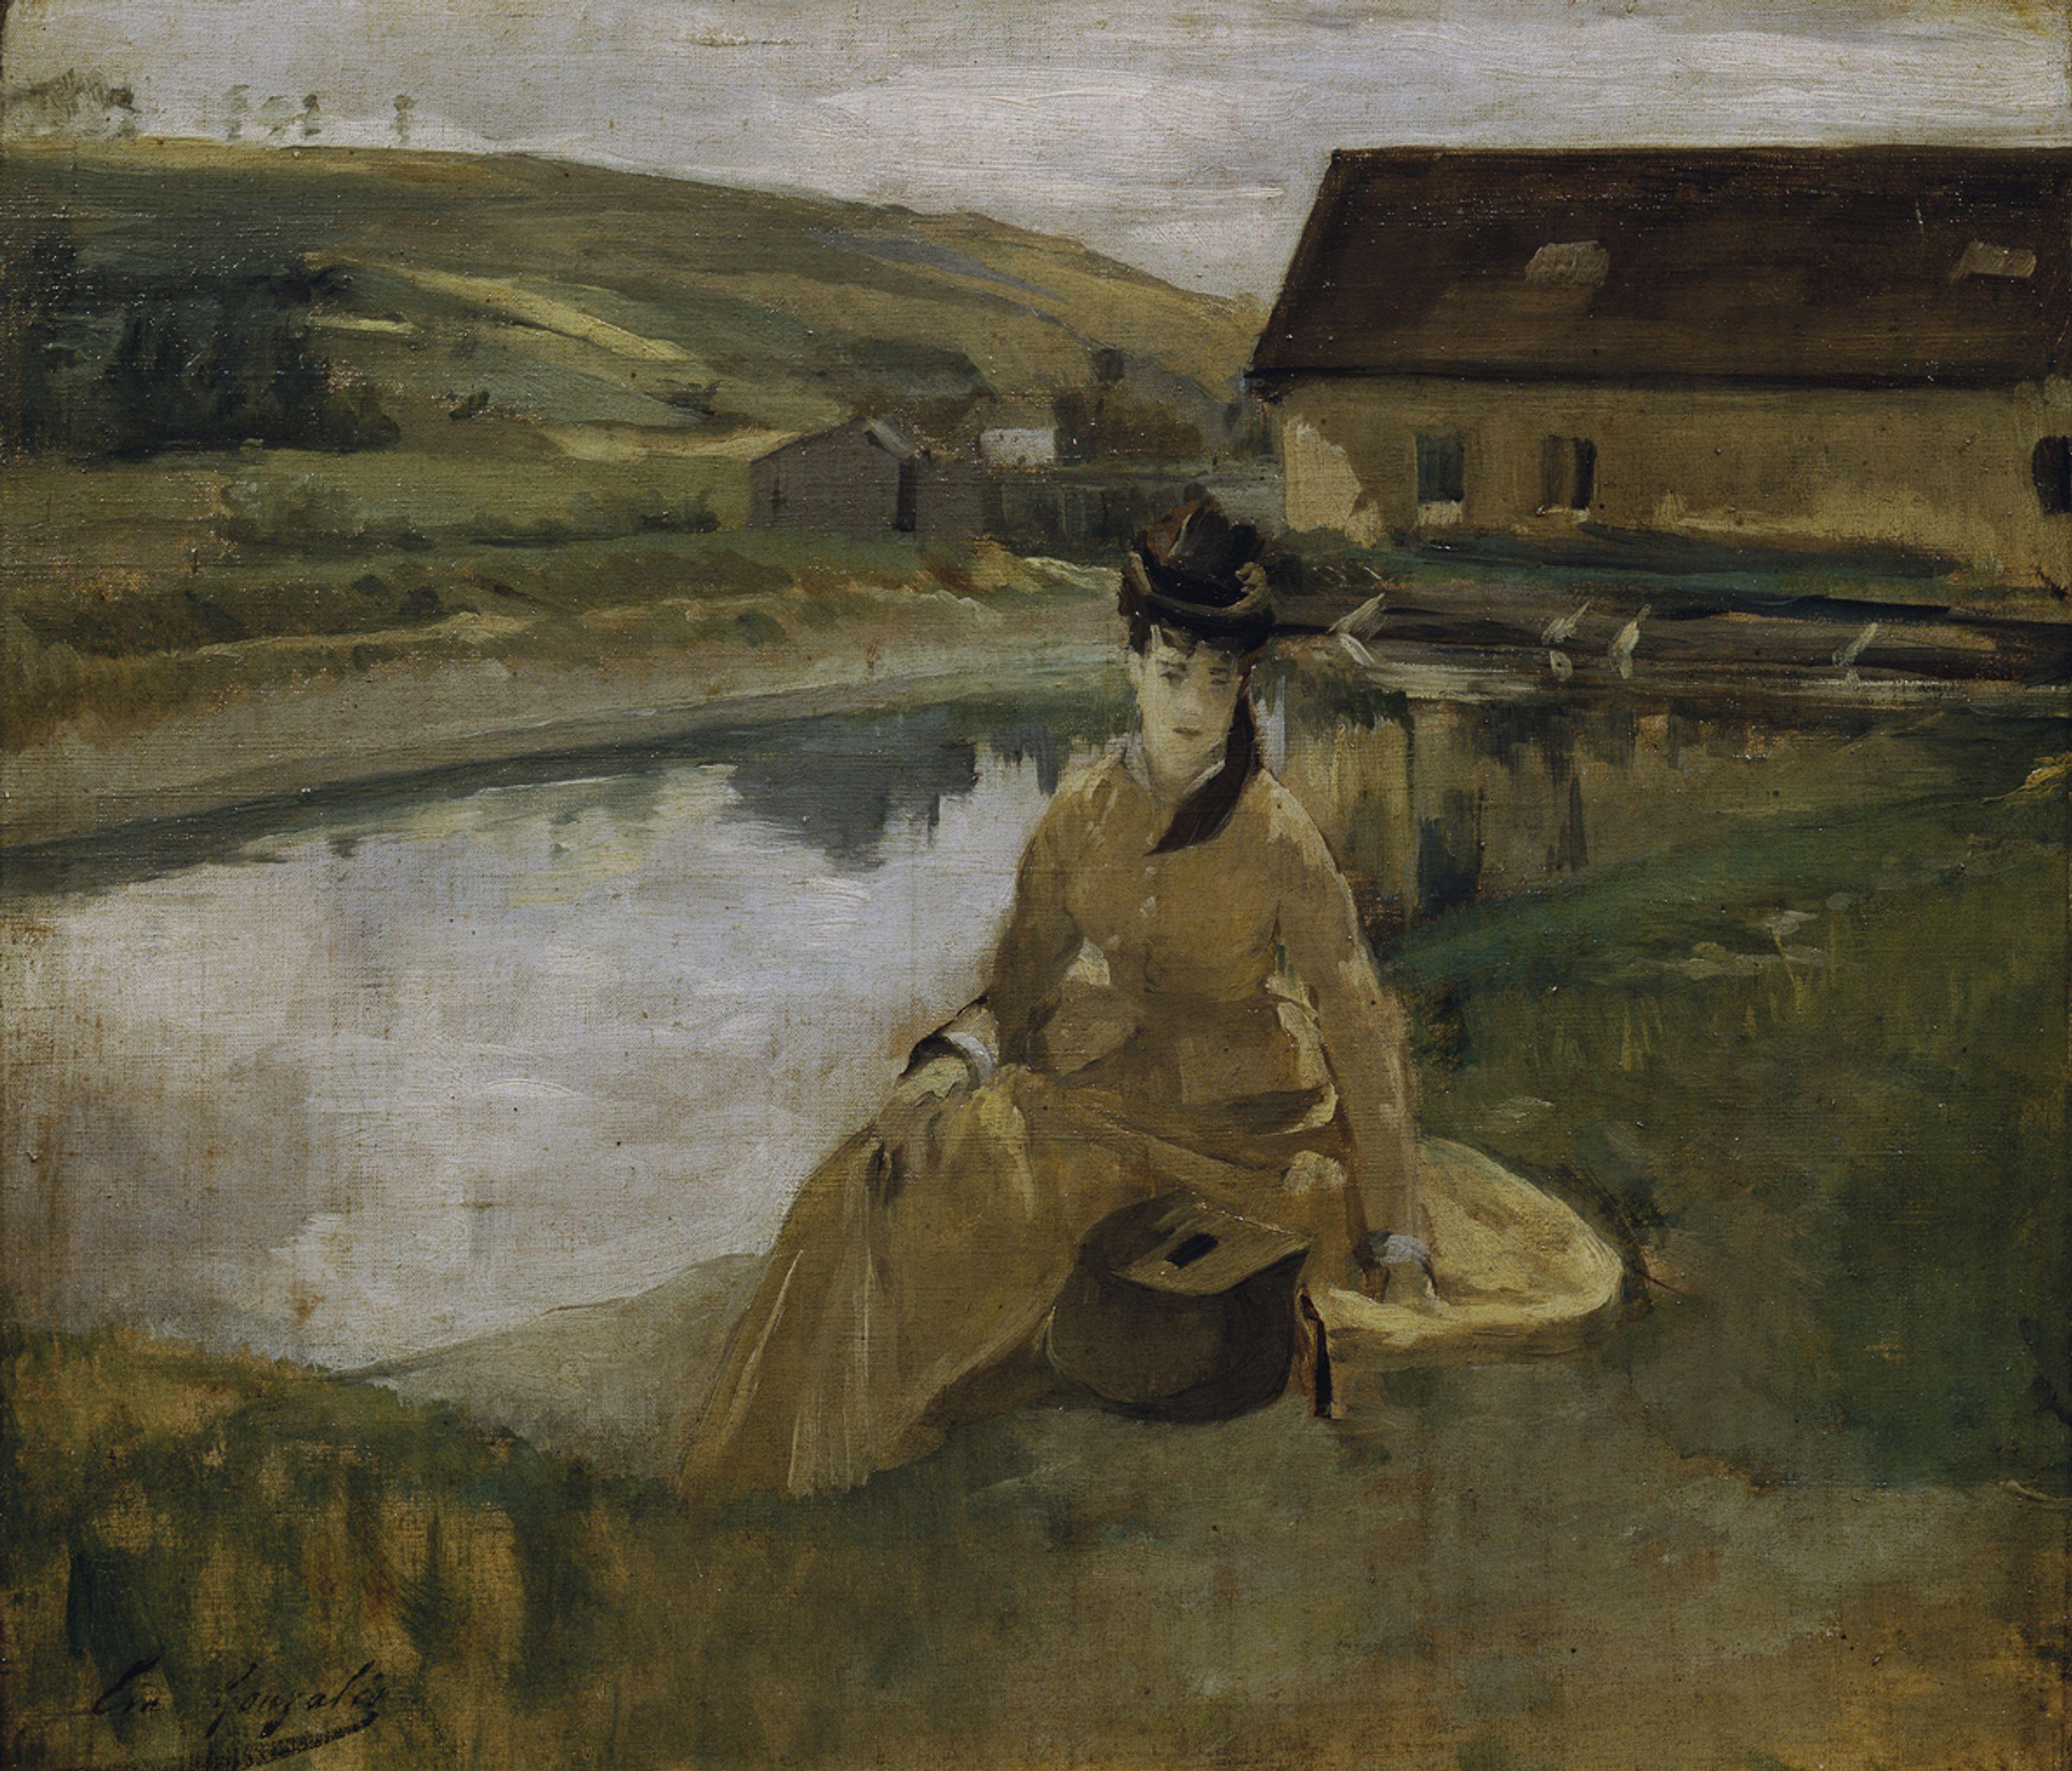 Eva Gonzales Am Wasser Um 1880 Ol Auf Leinwand 30 9 X 35 7 Cm Belvedere Wien Eva Gonzales Famous Impressionist Paintings Painting